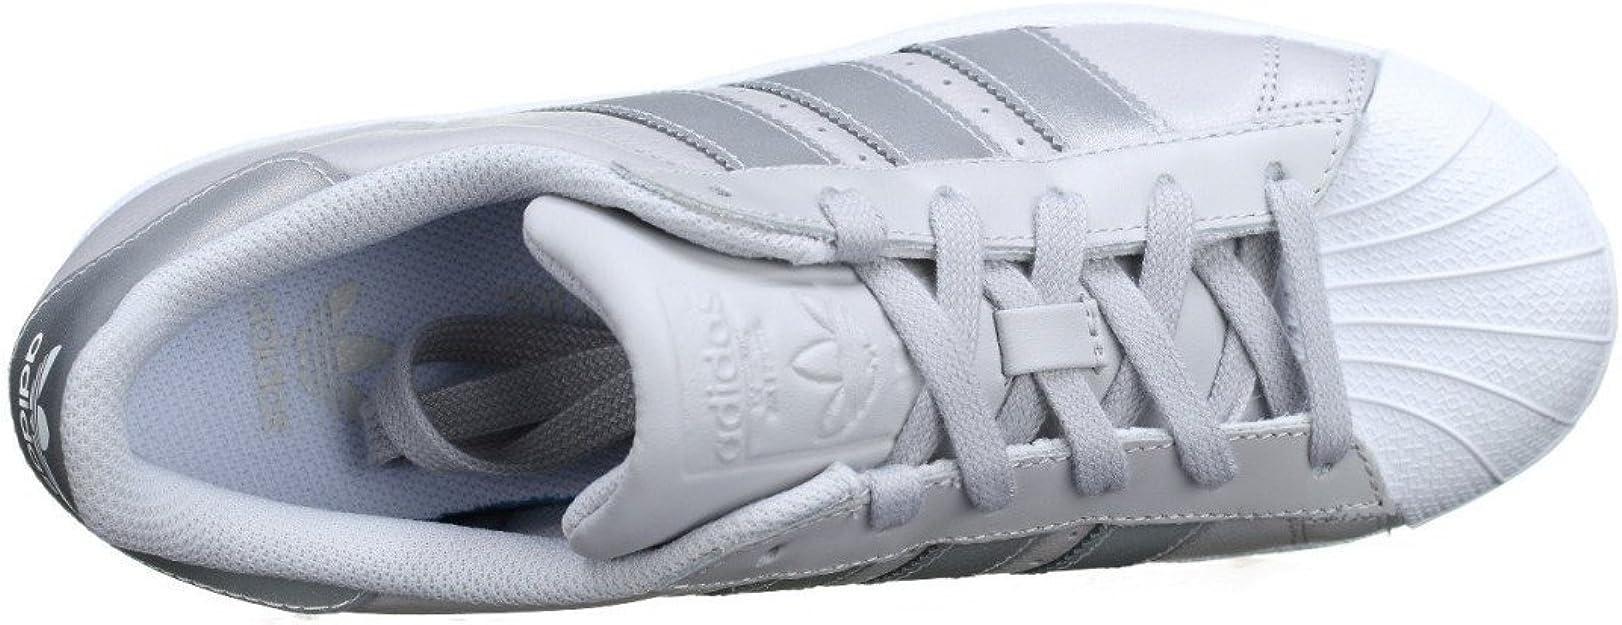 adidas Originals Basket Superstar Junior CQ2689 36: Amazon